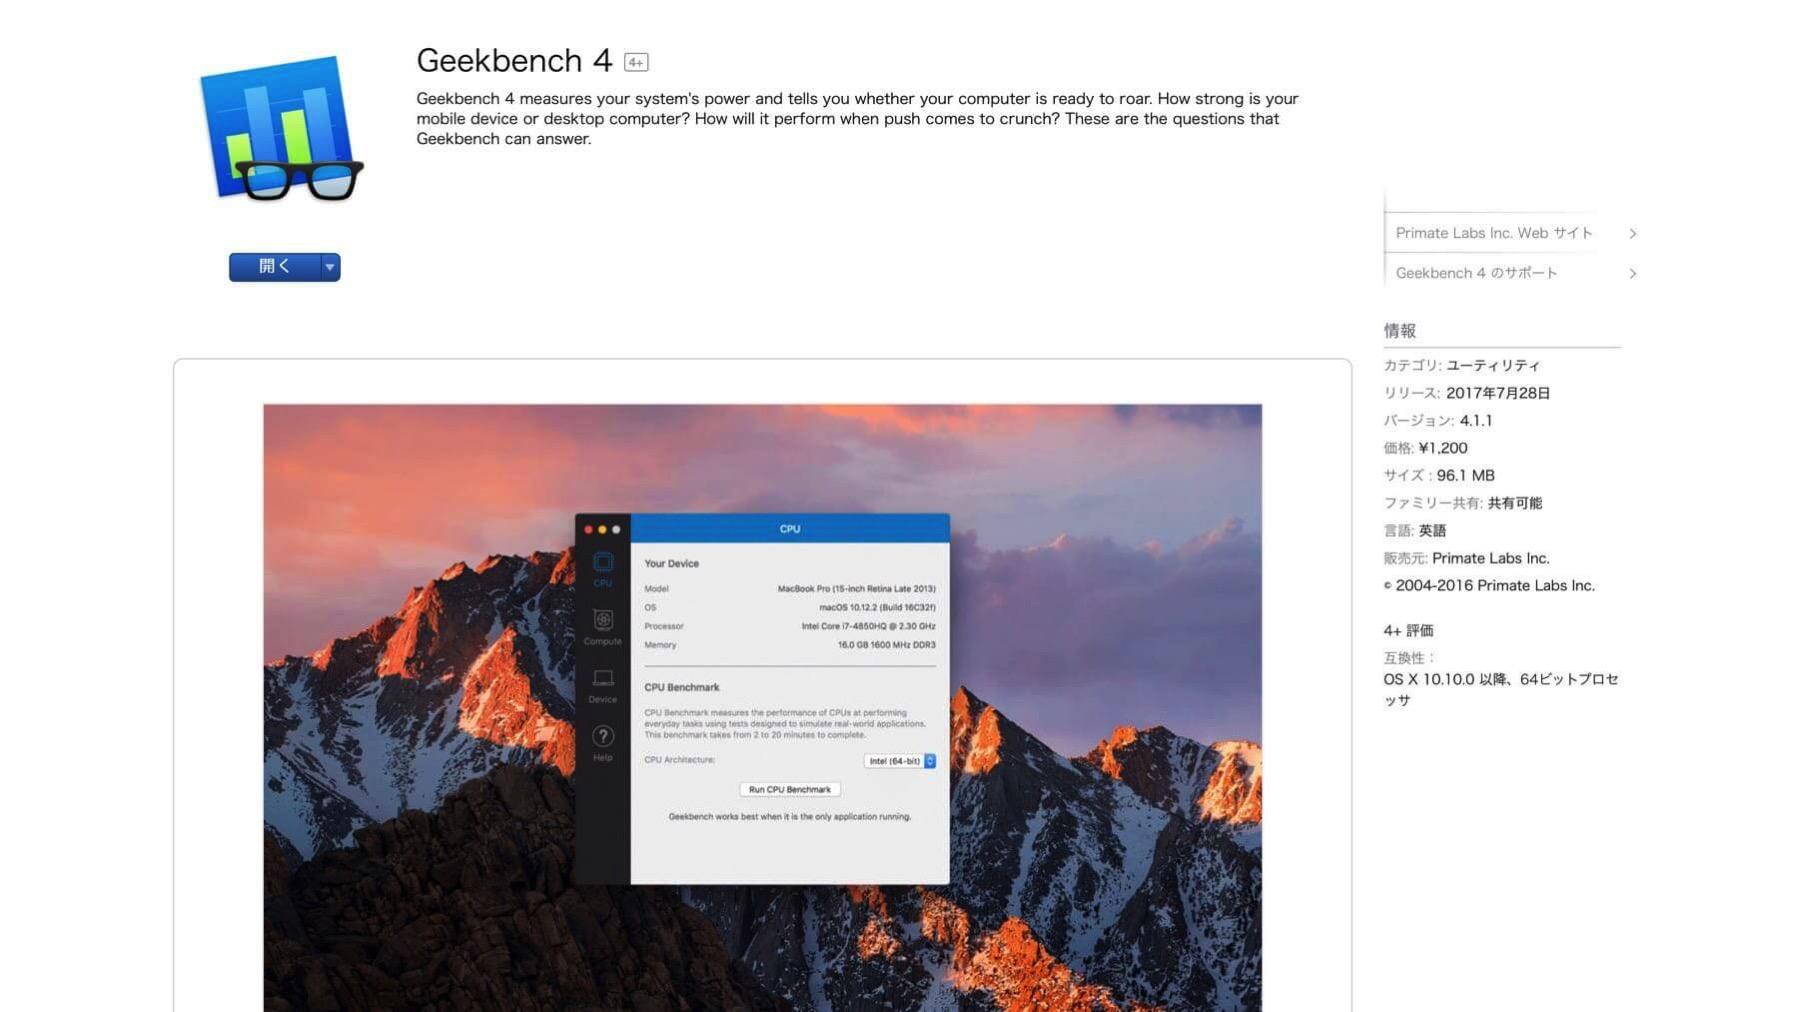 06 Geekbench4 1 1